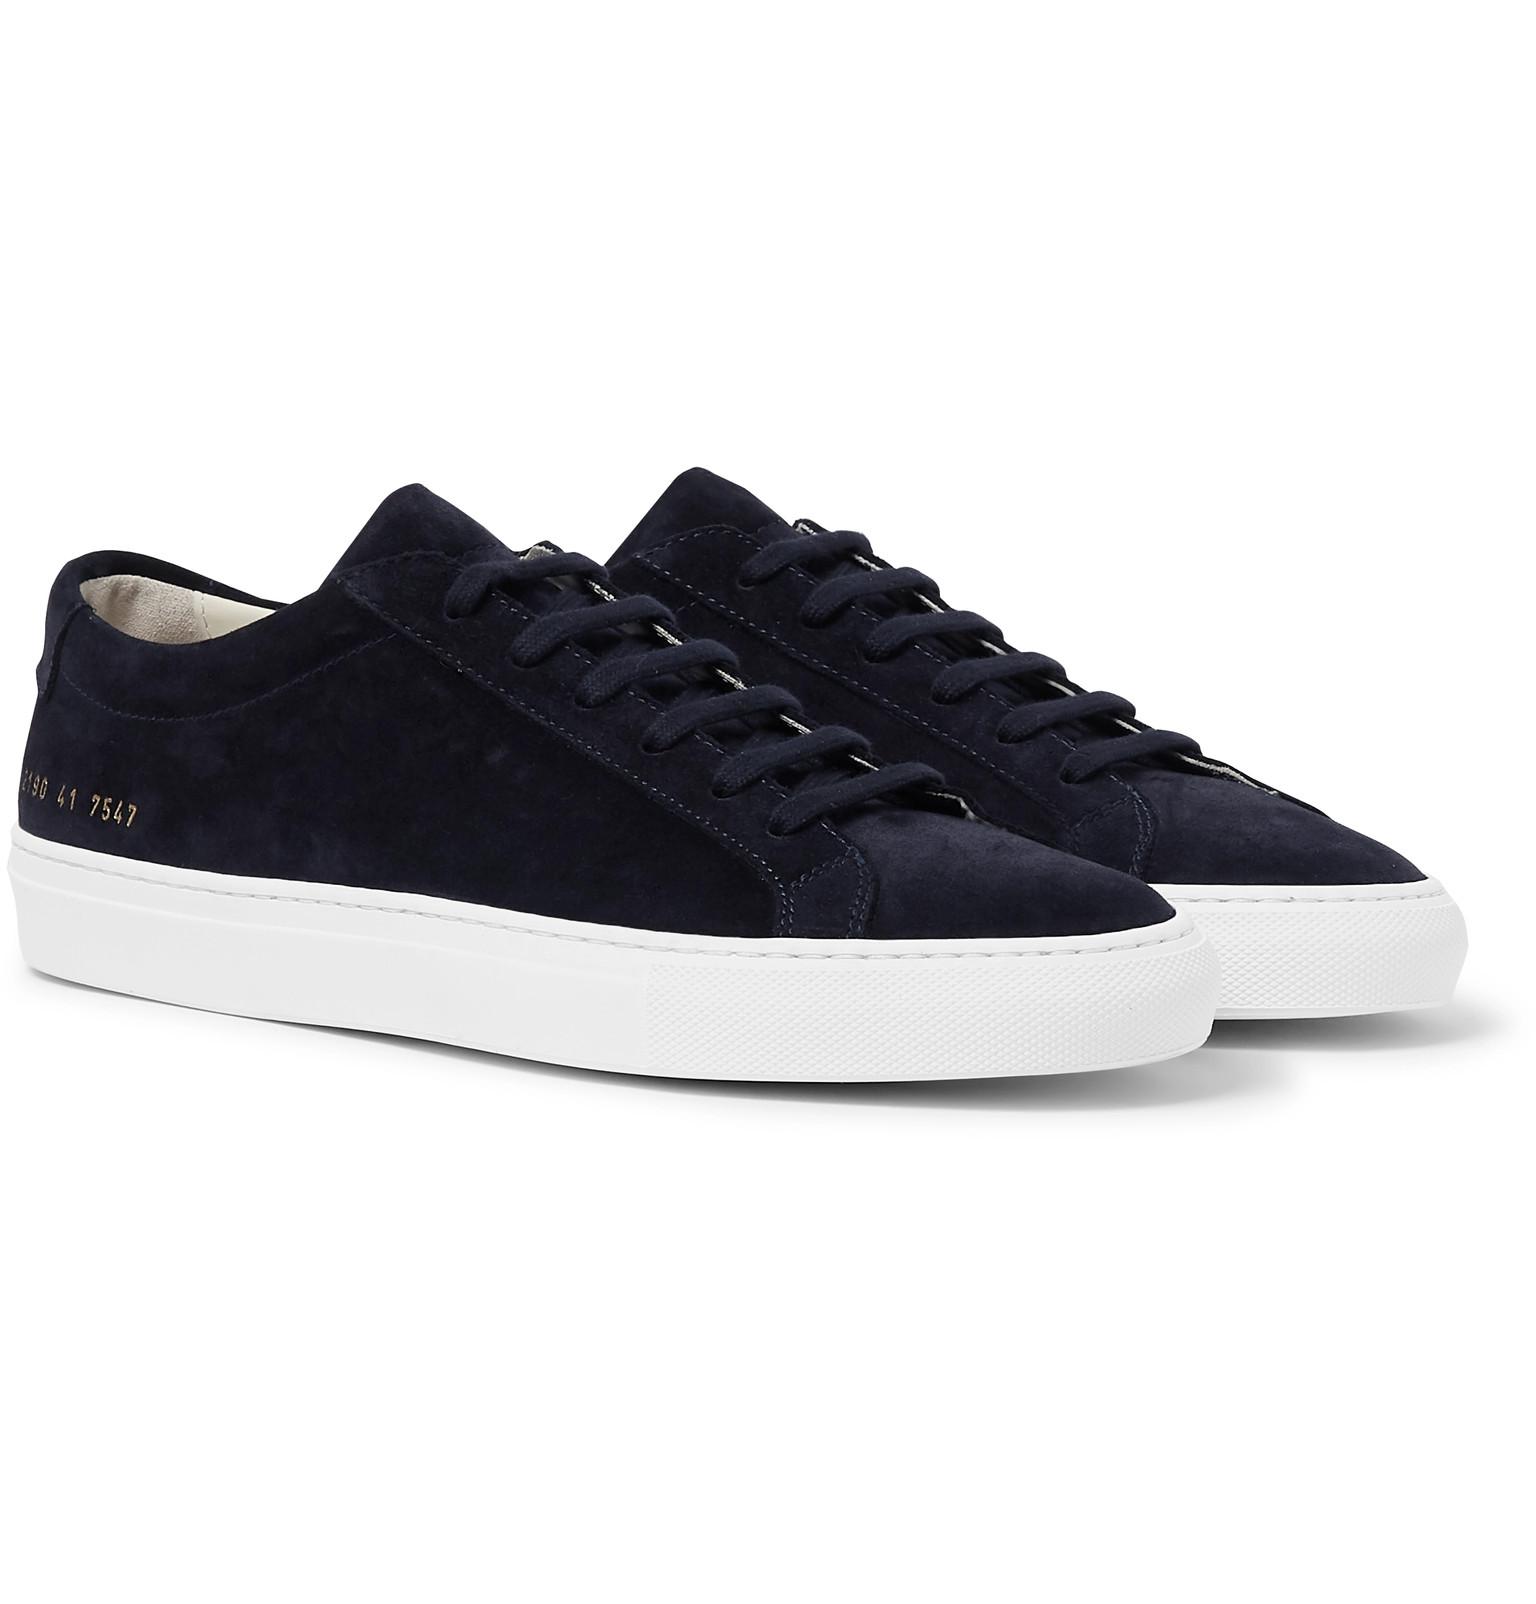 fa06d9eec58b Common Projects - Original Achilles Suede Sneakers